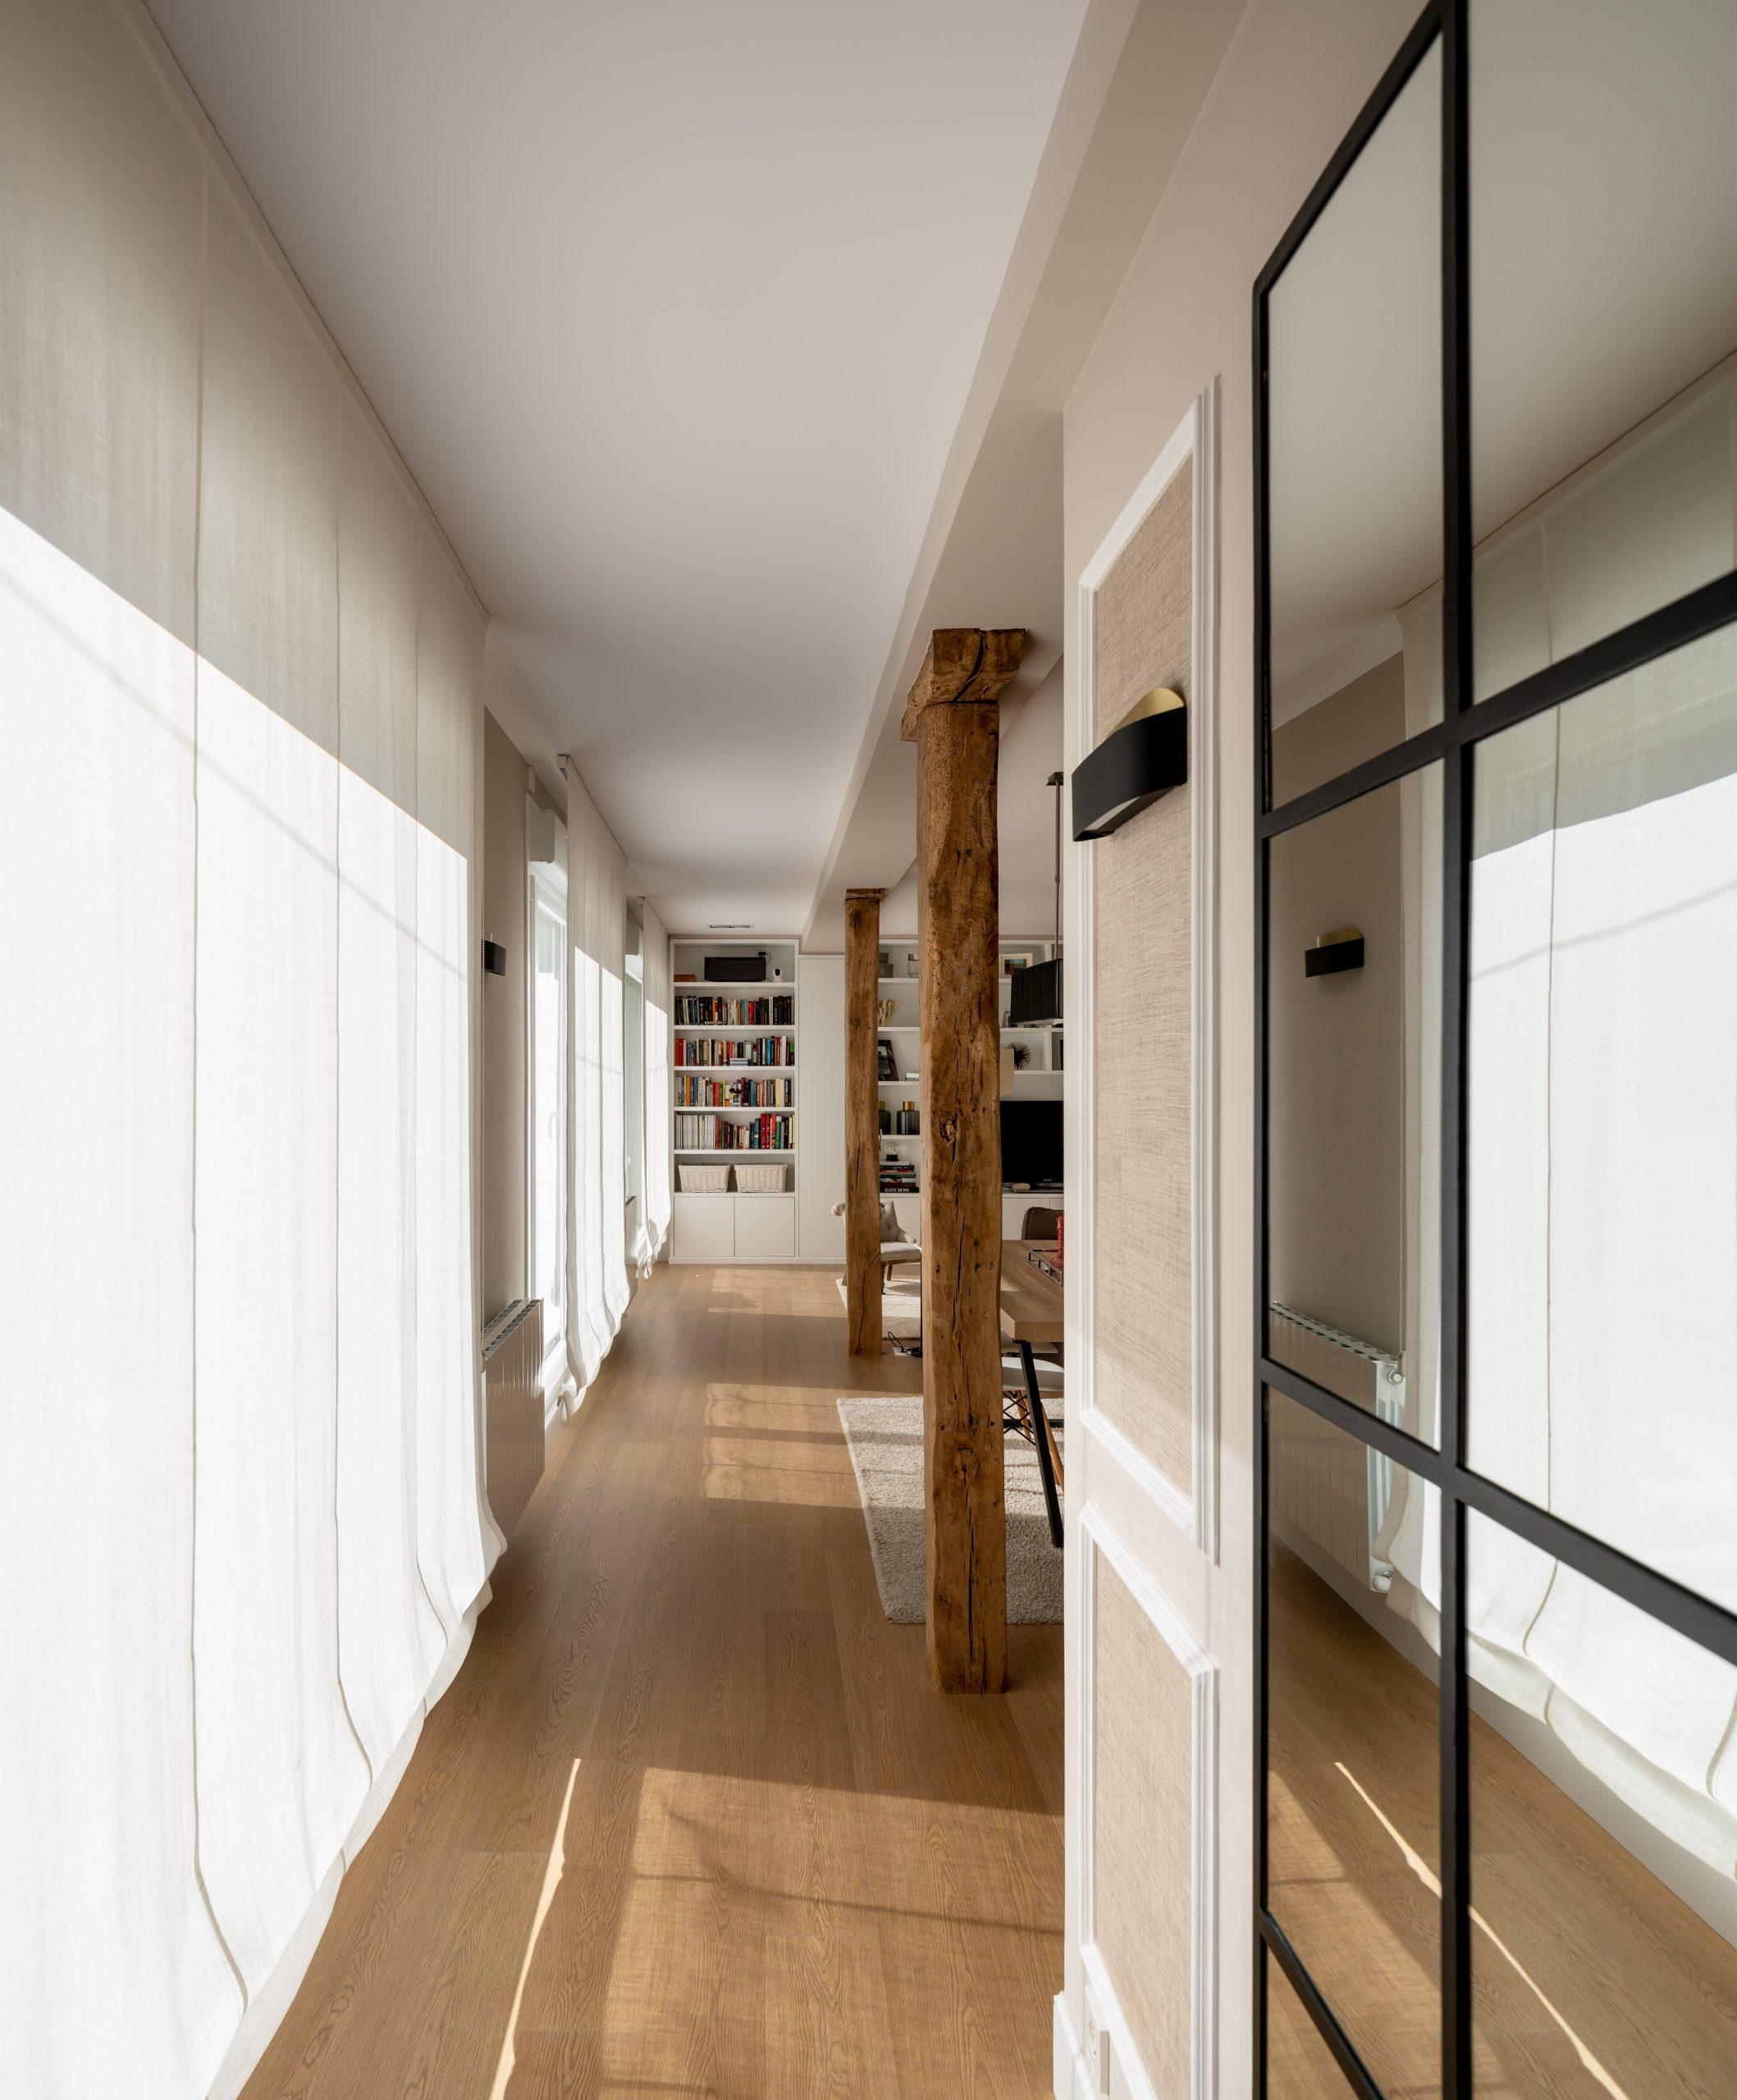 Fotógrafo de arquitectura en Bilbao - Imagen de recibidor